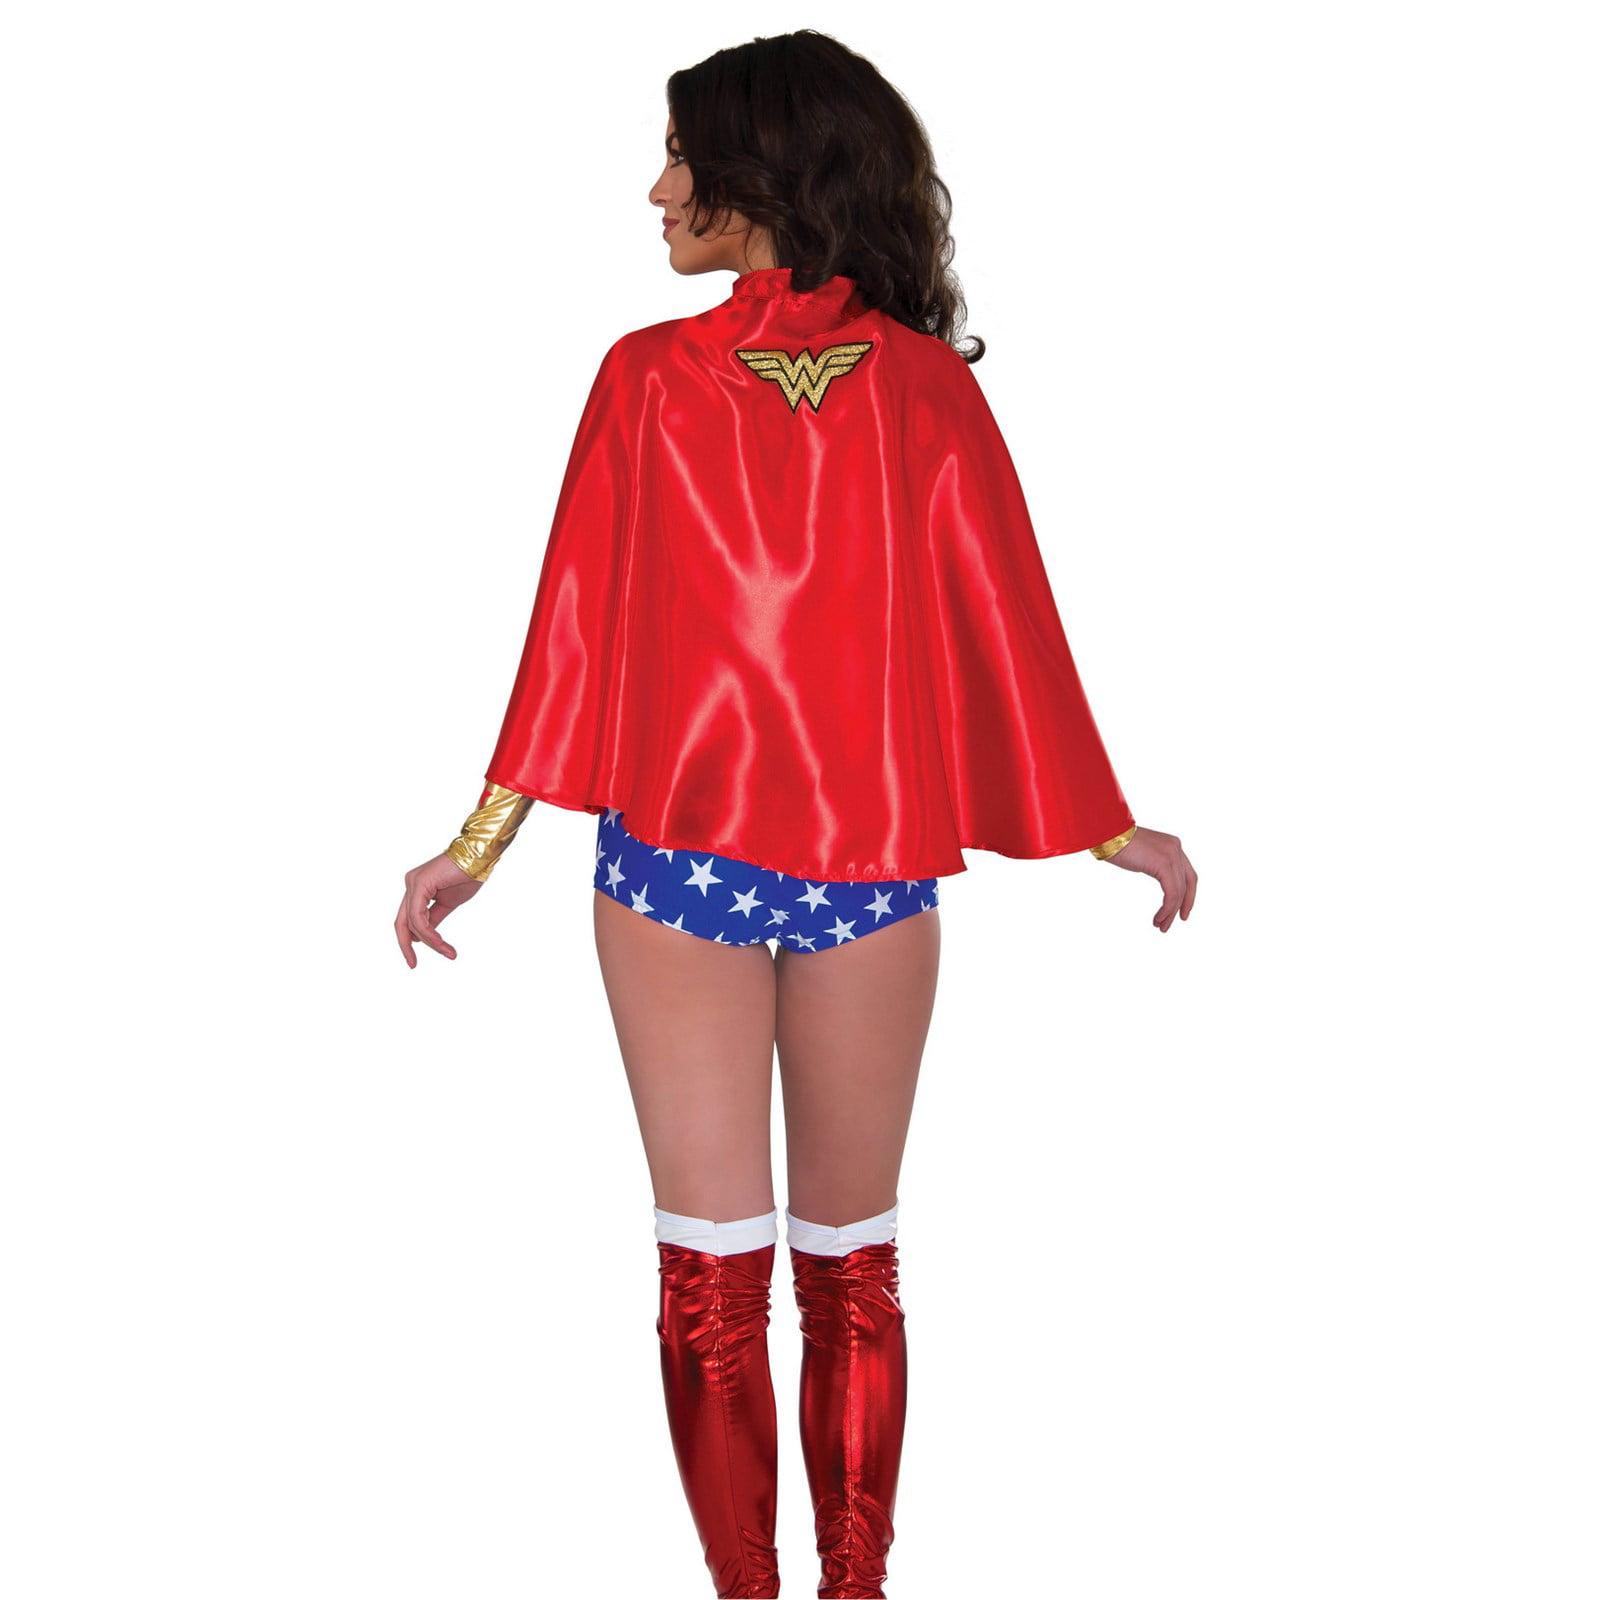 Cape Wonder Woman